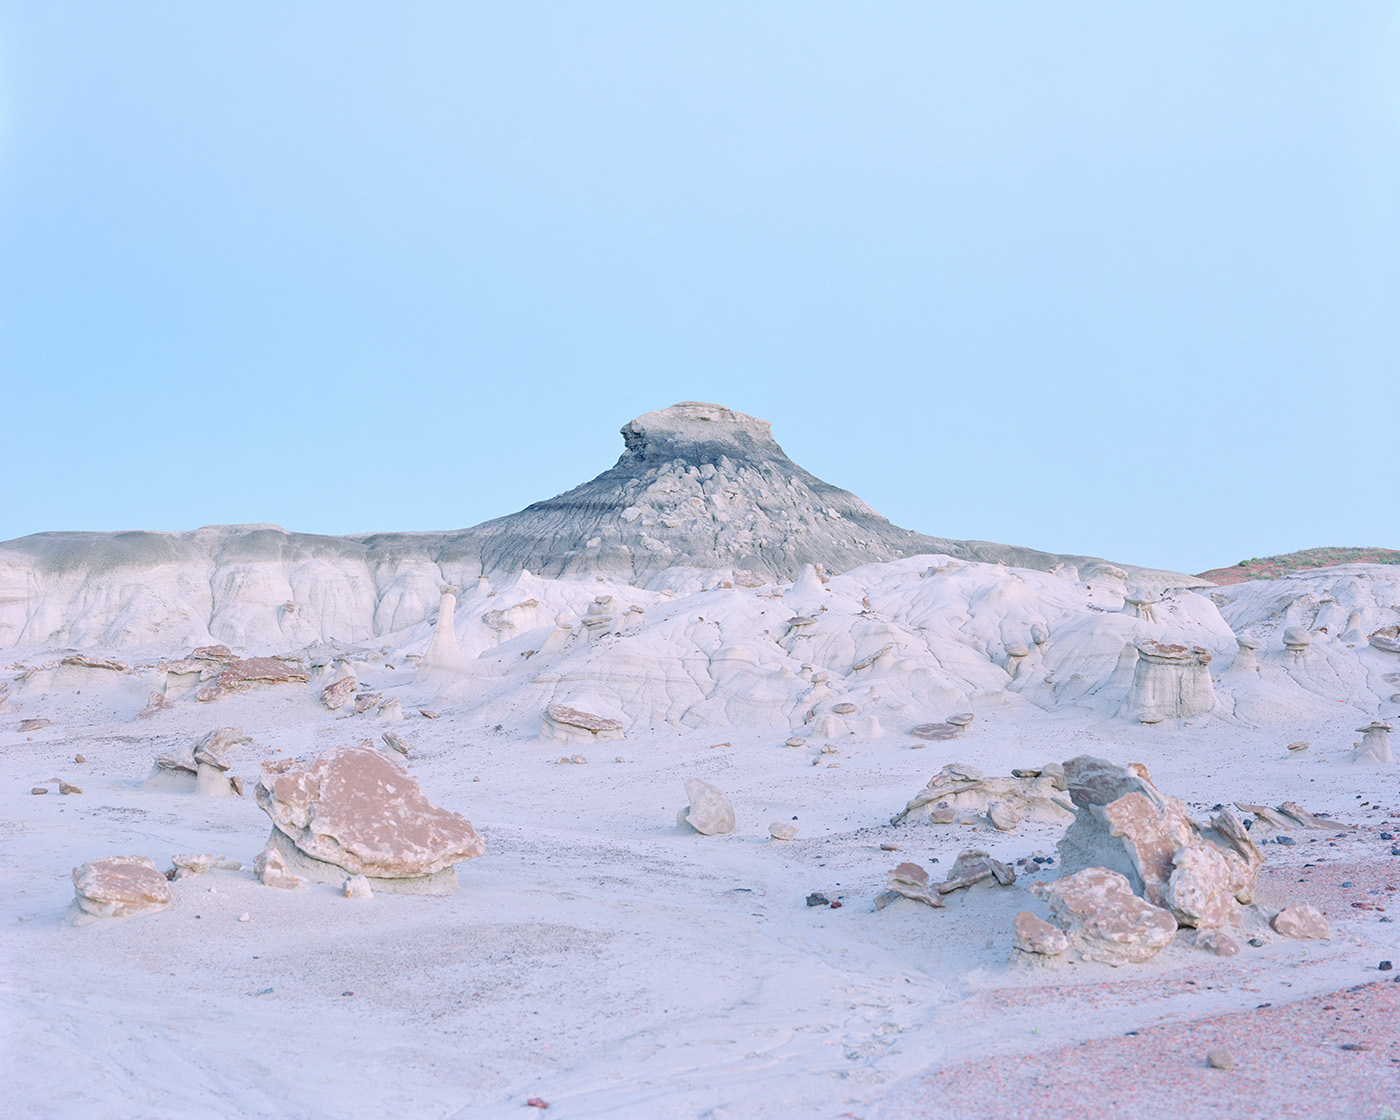 I paesaggi americani fotografati da Luca Tombolini | Collater.al 8